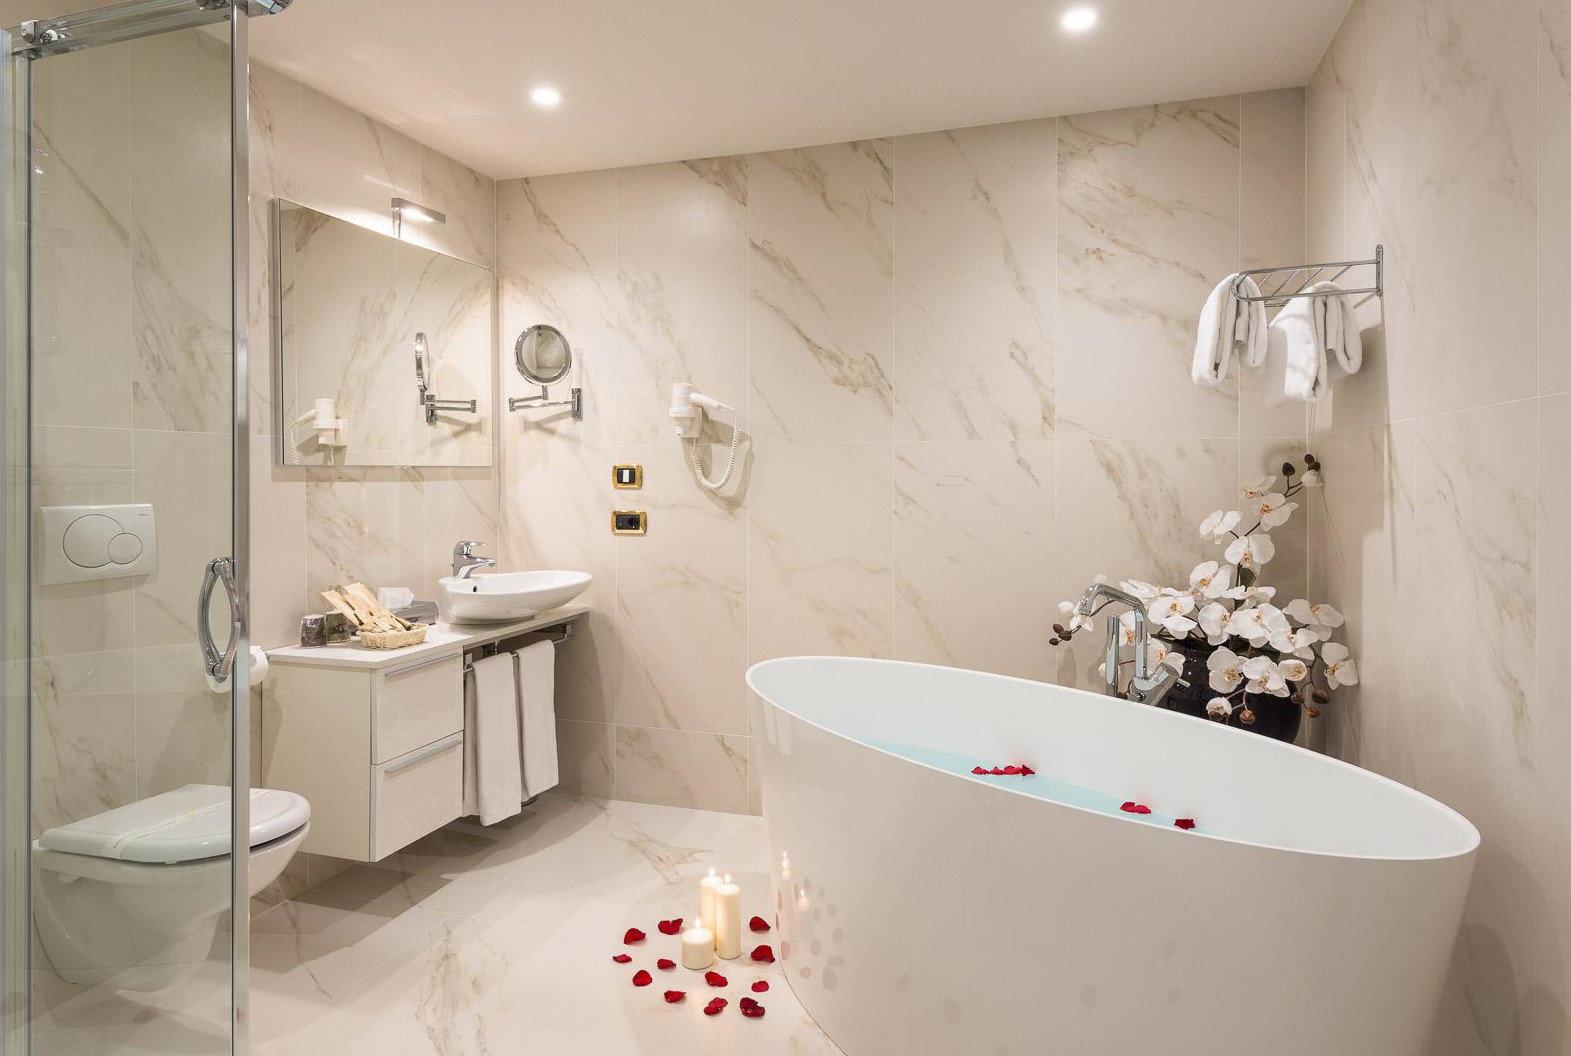 bathroom sink bathtub plumbing fixture bidet toilet flooring tiled